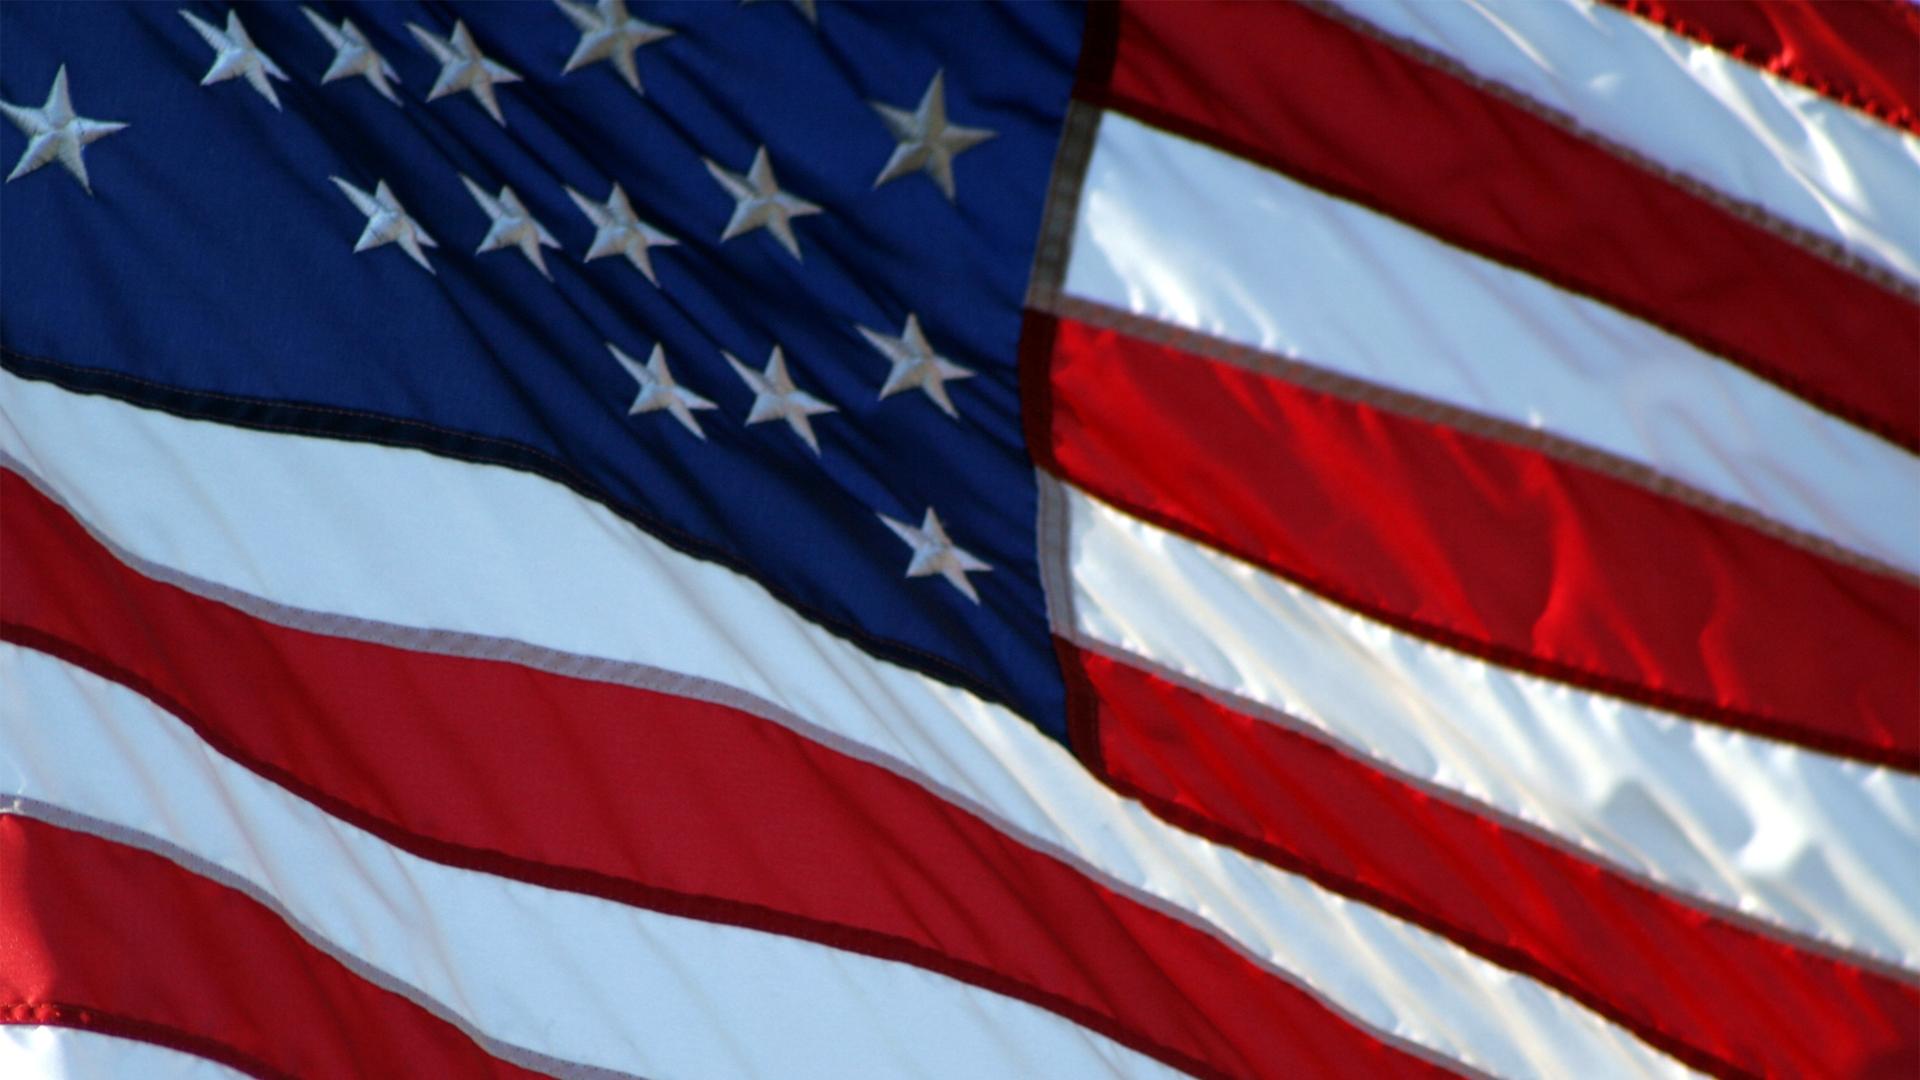 Man Made American Flag 1920x1080